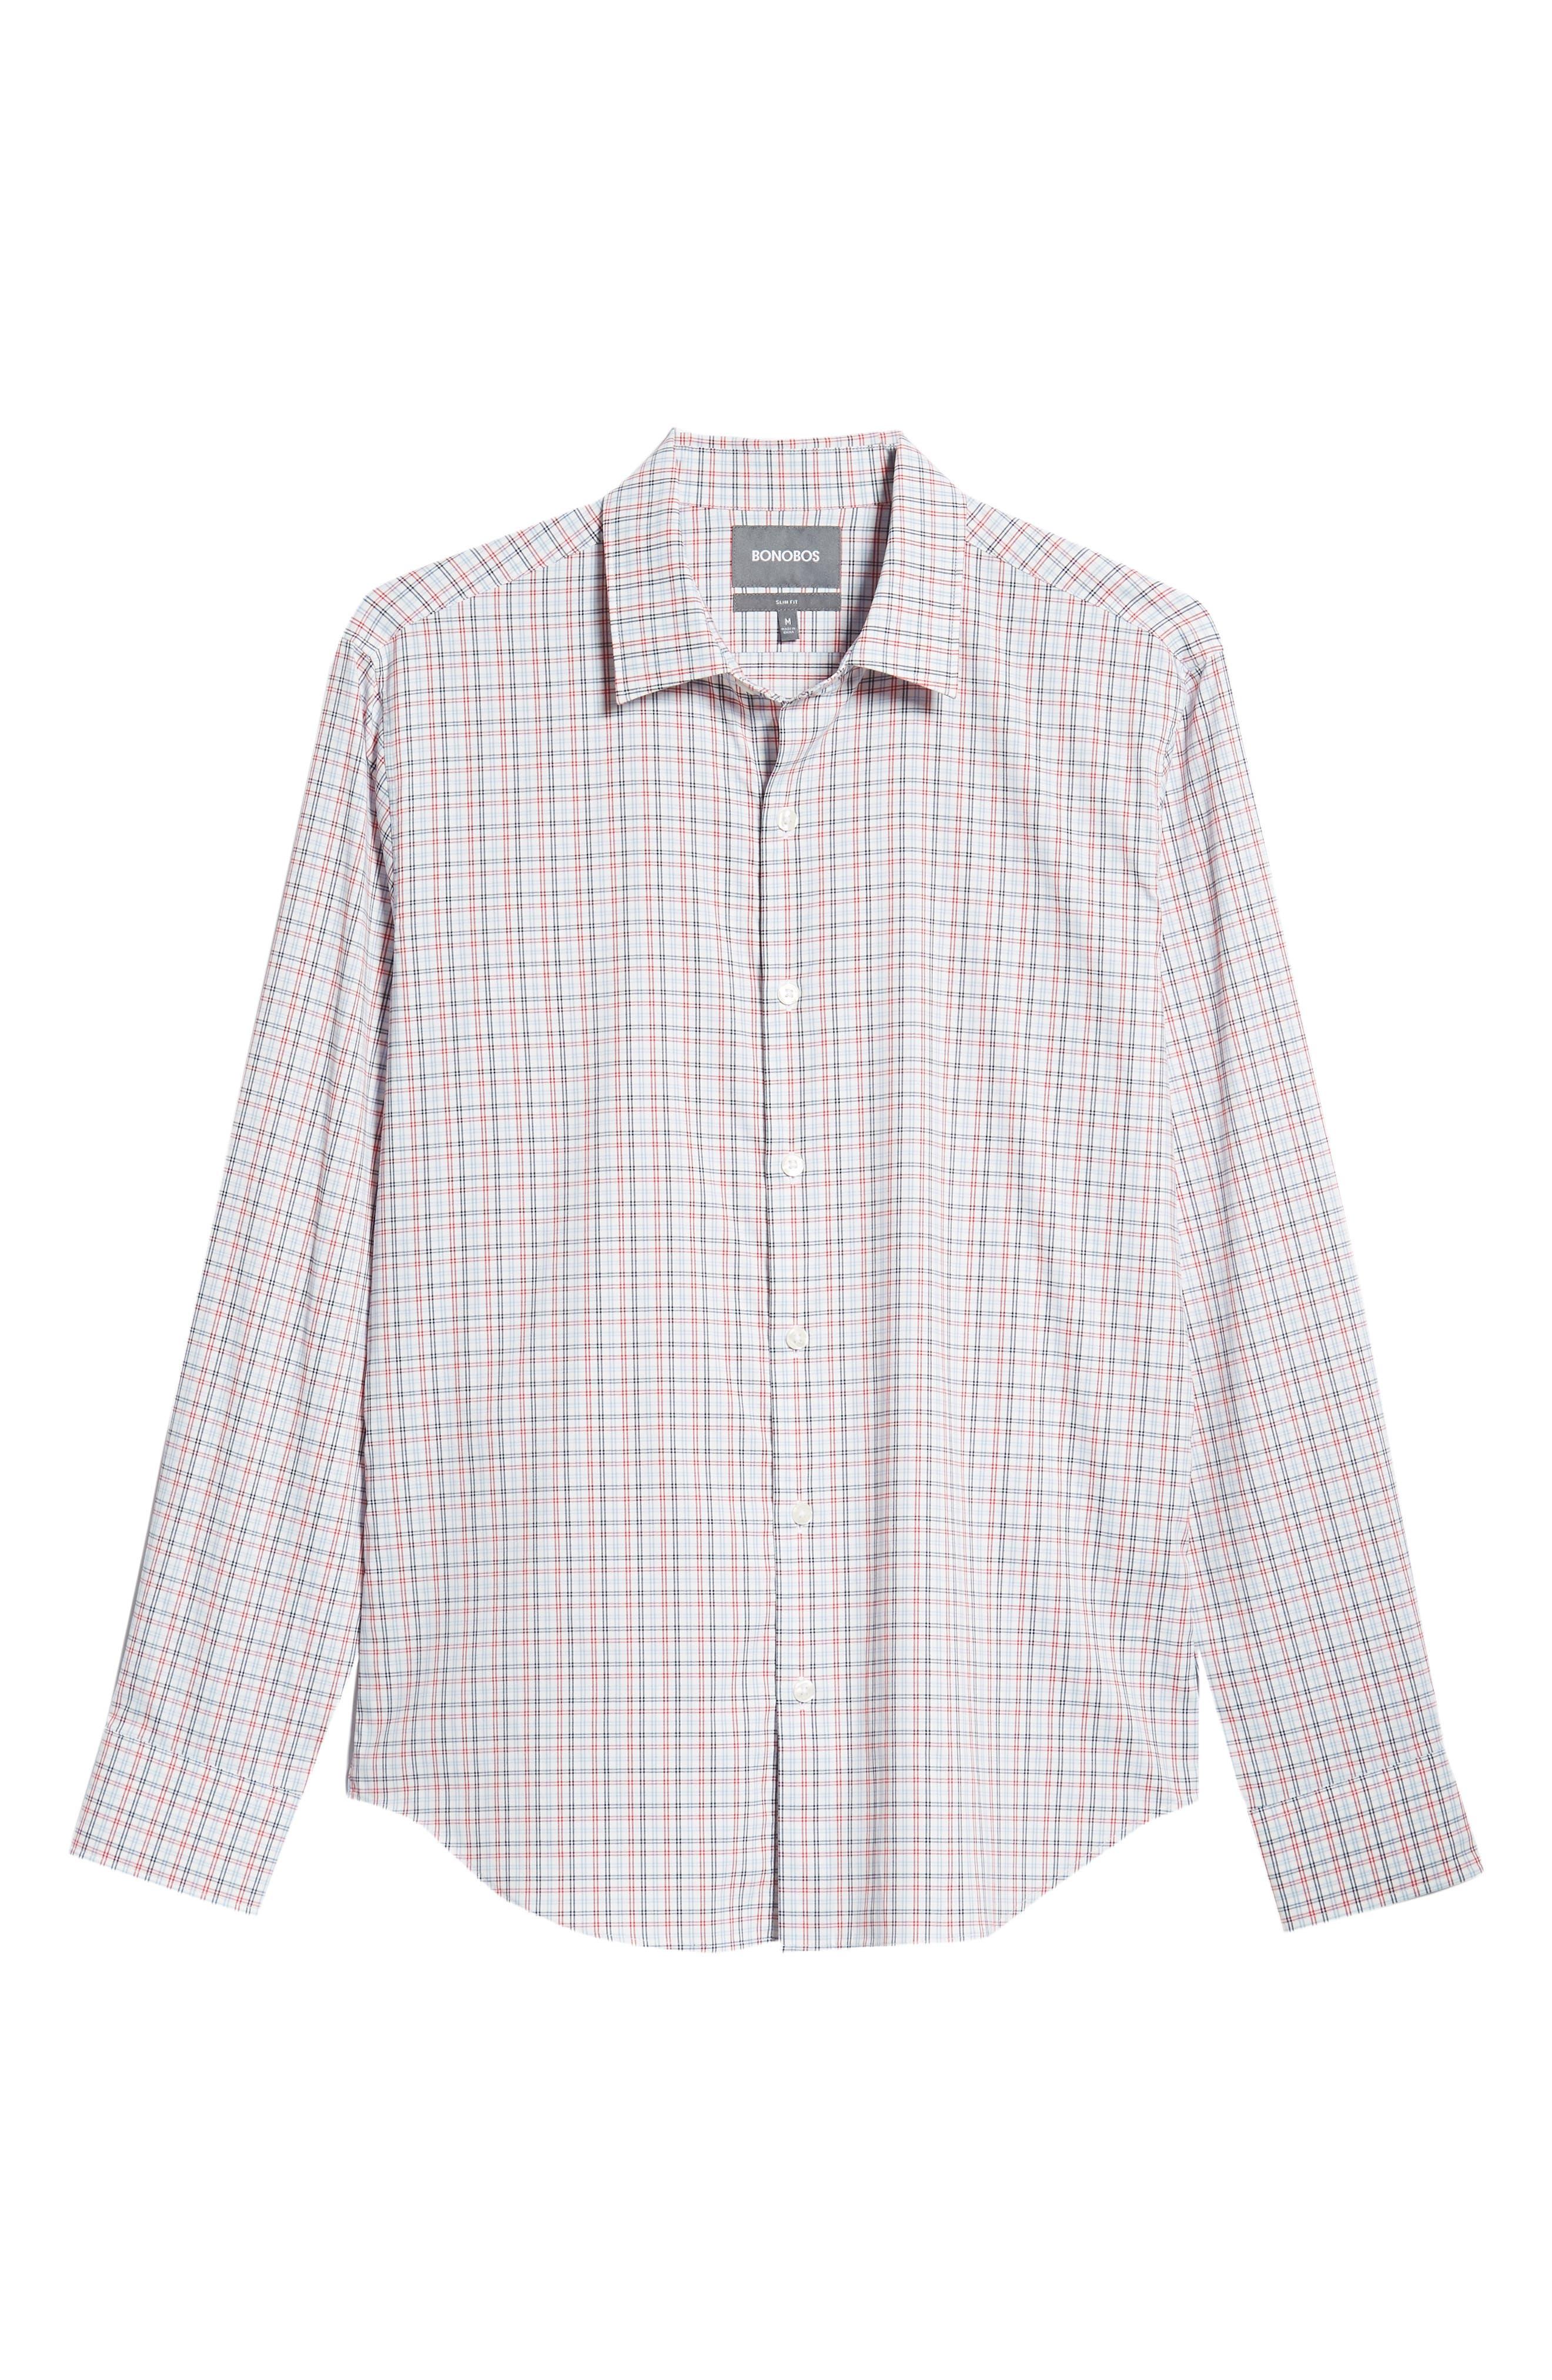 Slim Fit Check Performance Sport Shirt,                             Alternate thumbnail 5, color,                             HILLGROVE CHECK - CERISE